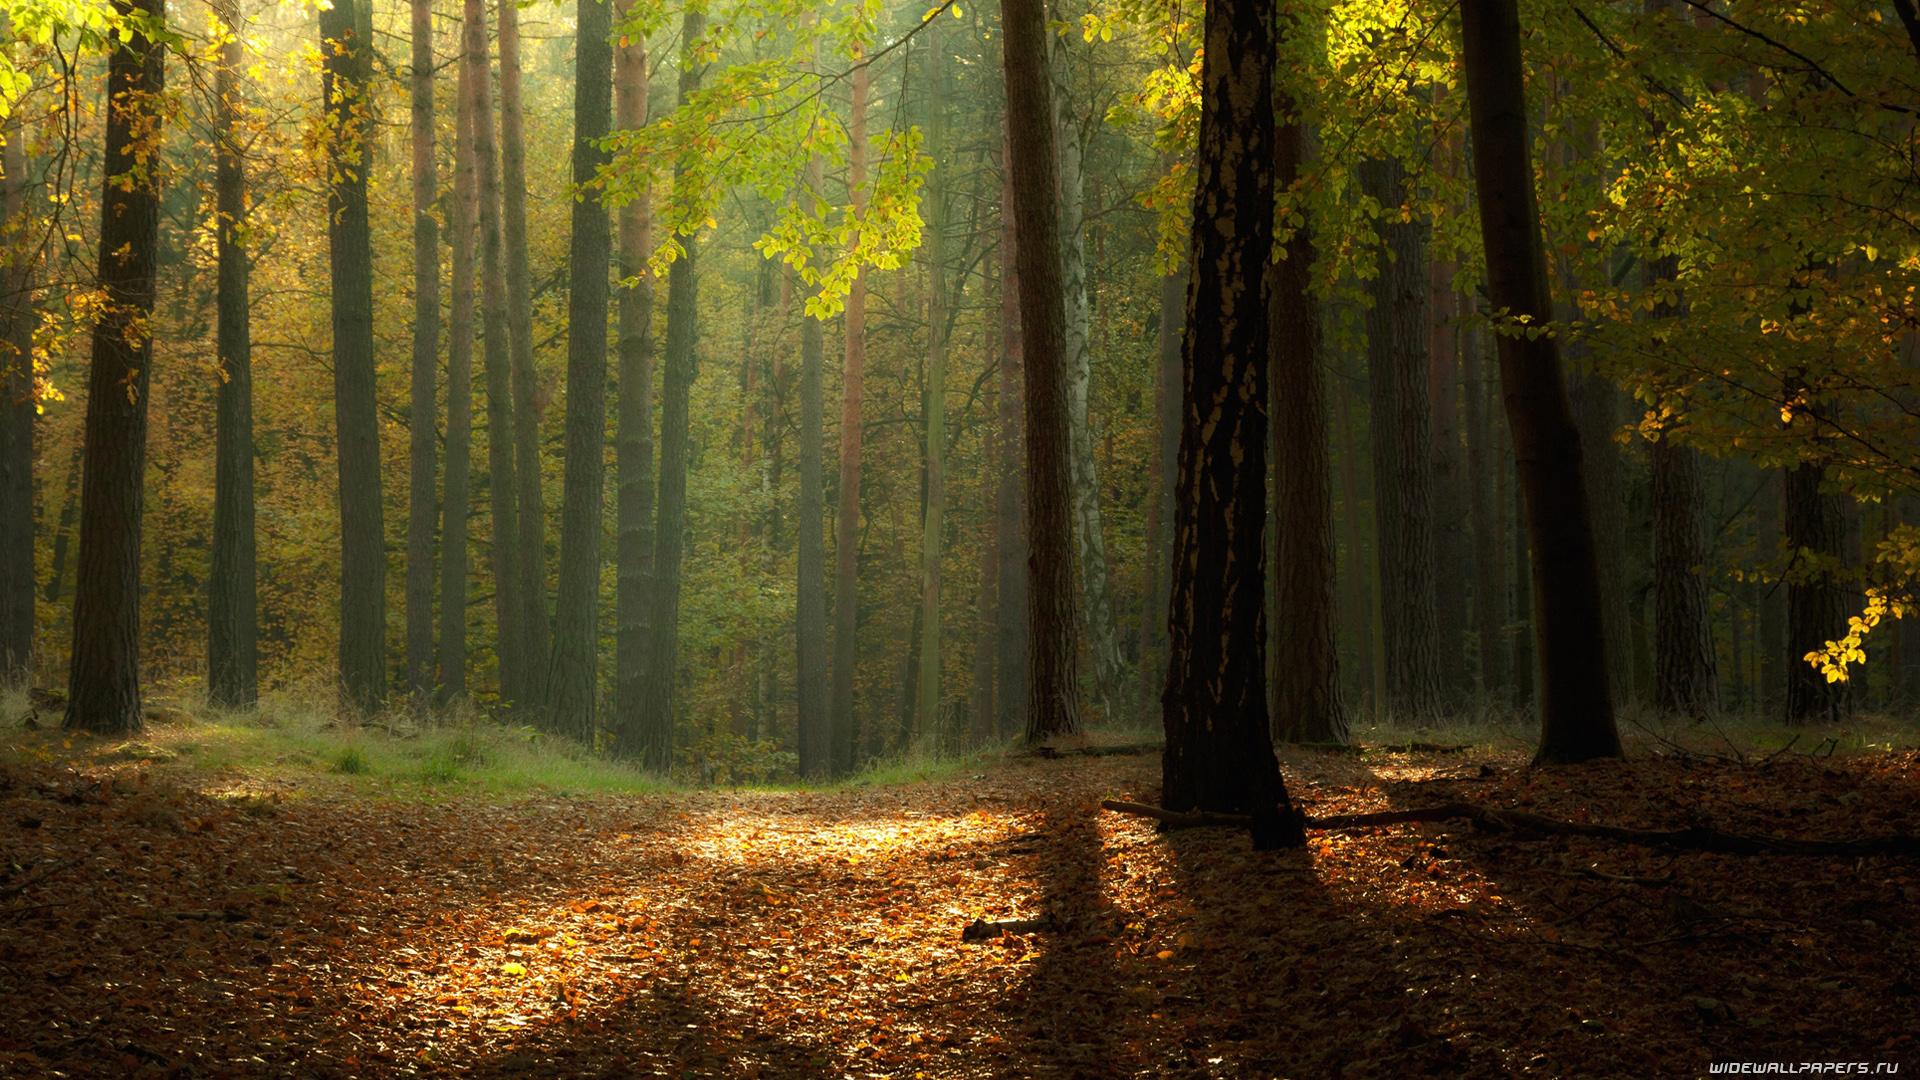 Download Wallpaper High Resolution Forest - orig  Snapshot_28143.net/get-pdb/34158/643ab35e-514b-4650-8006-e13a41146a83/orig